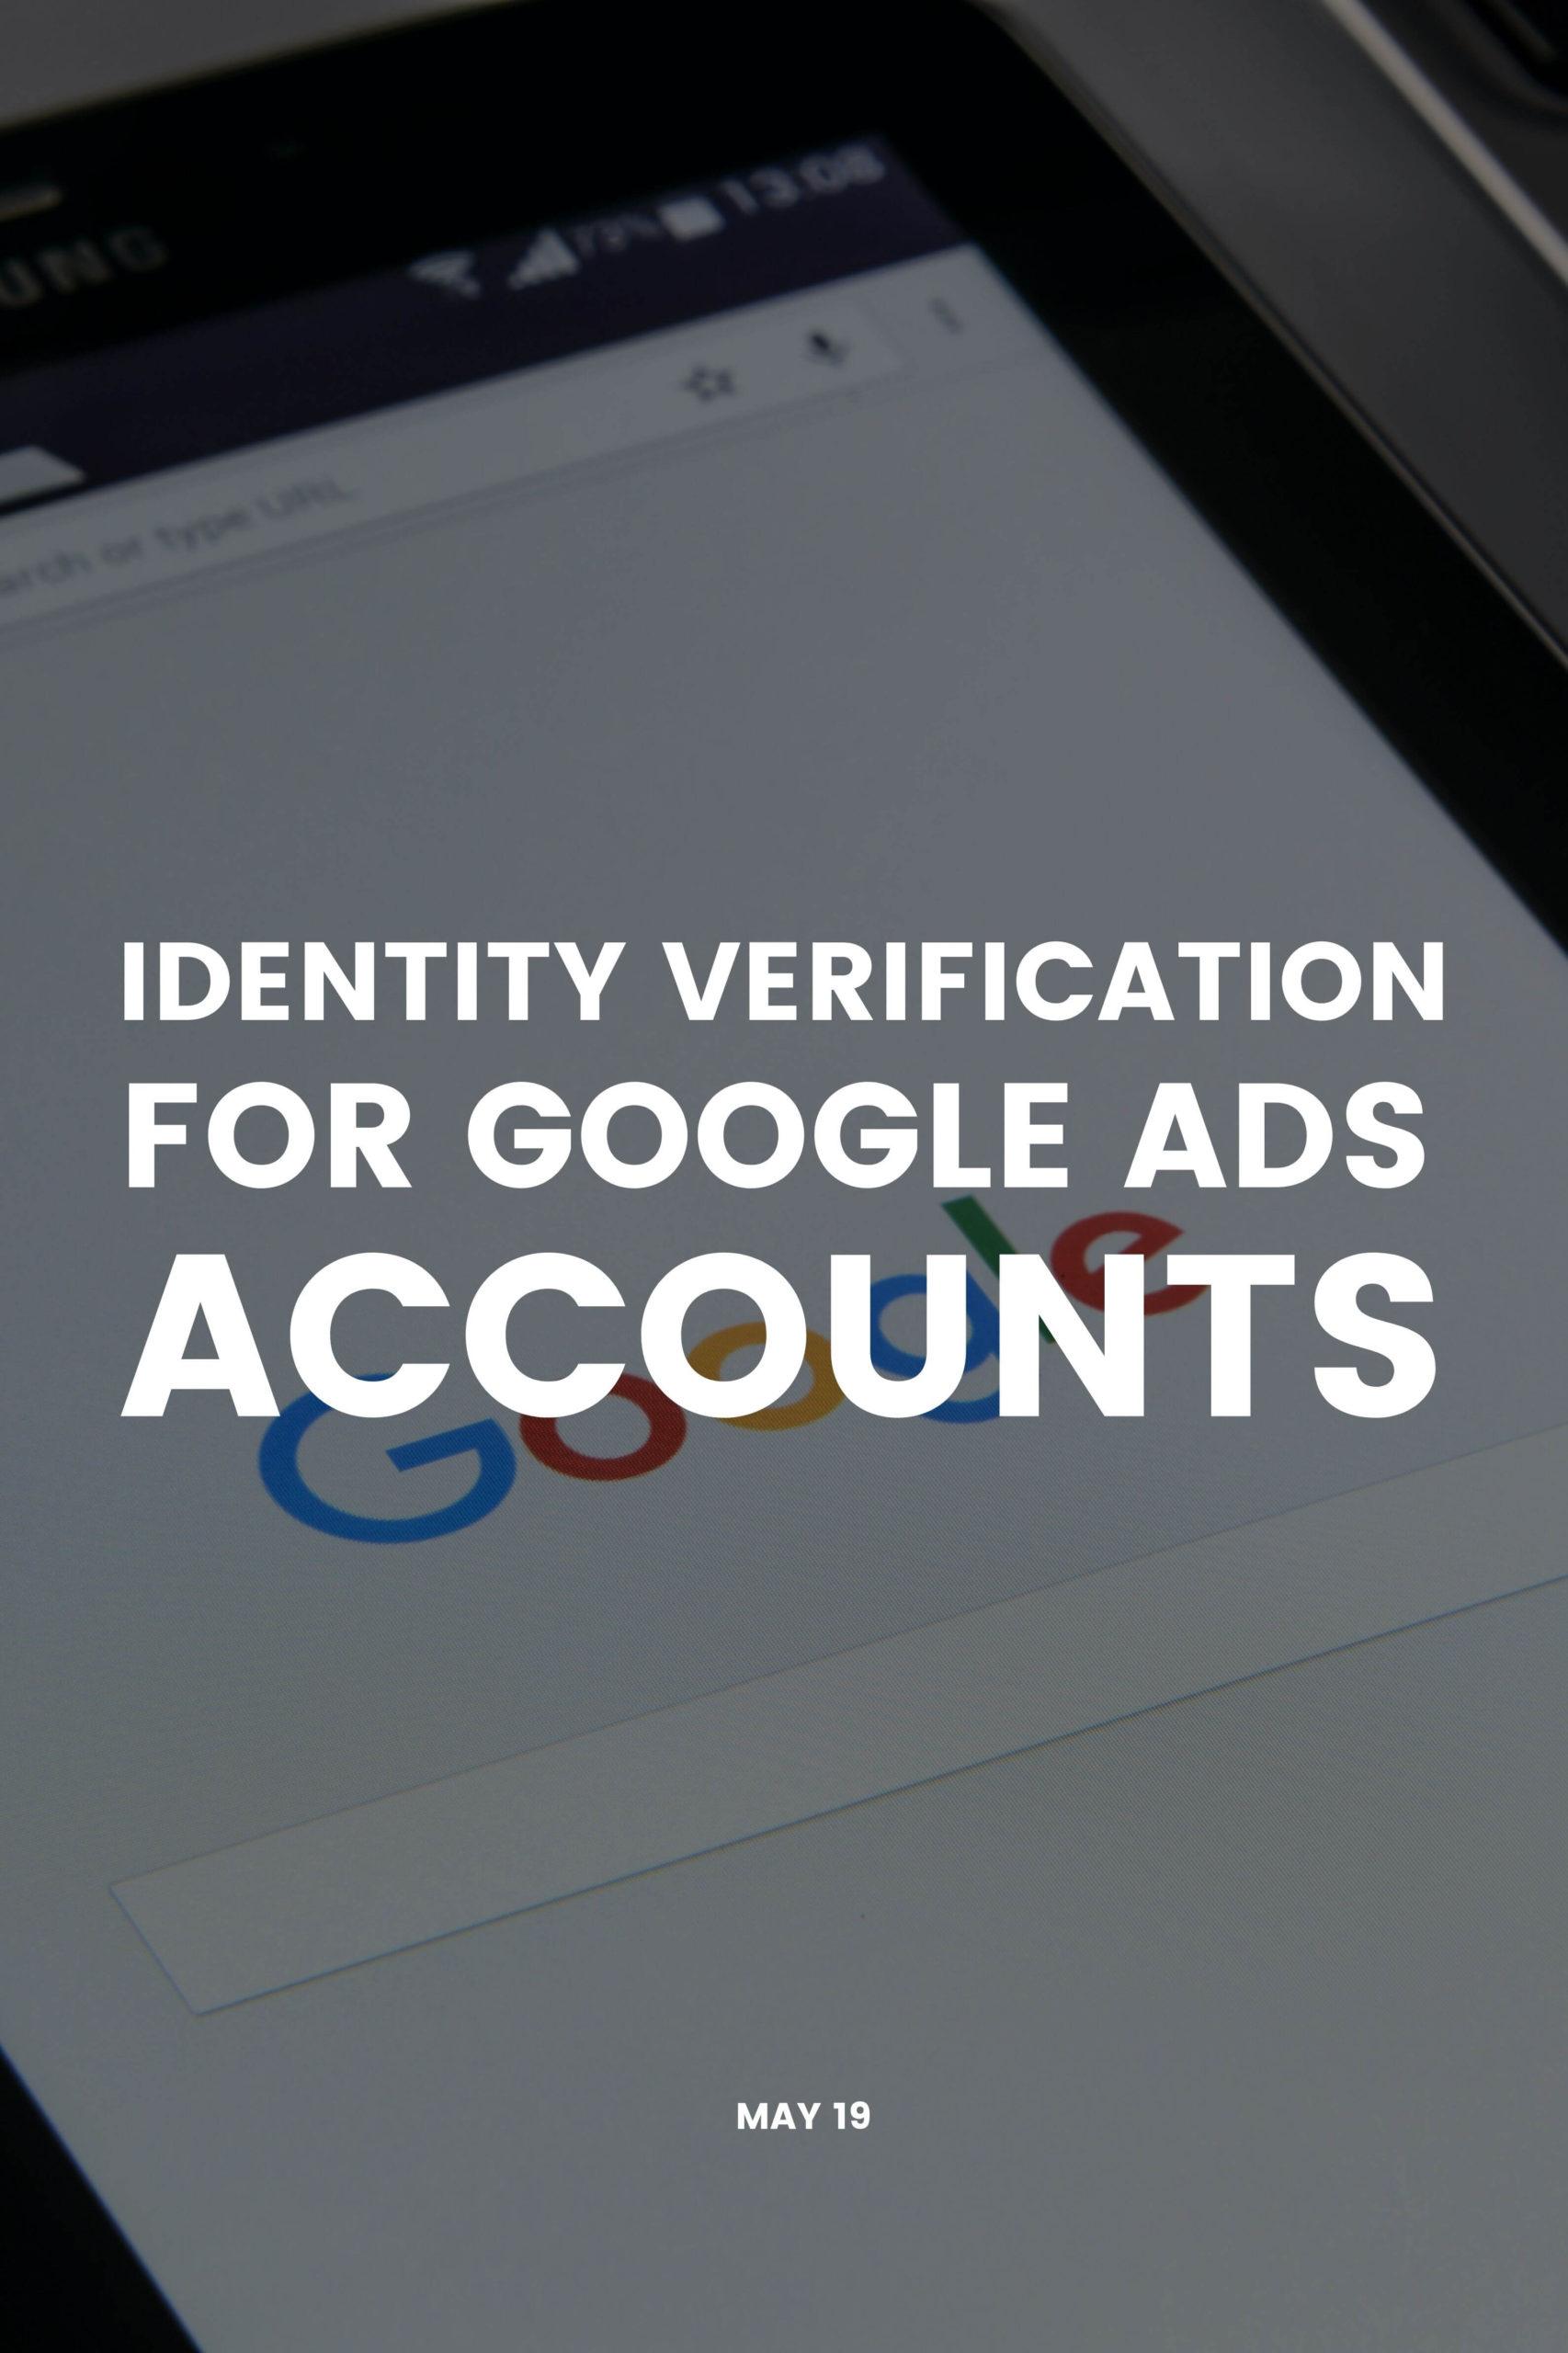 Identity verification for Google Ads accounts